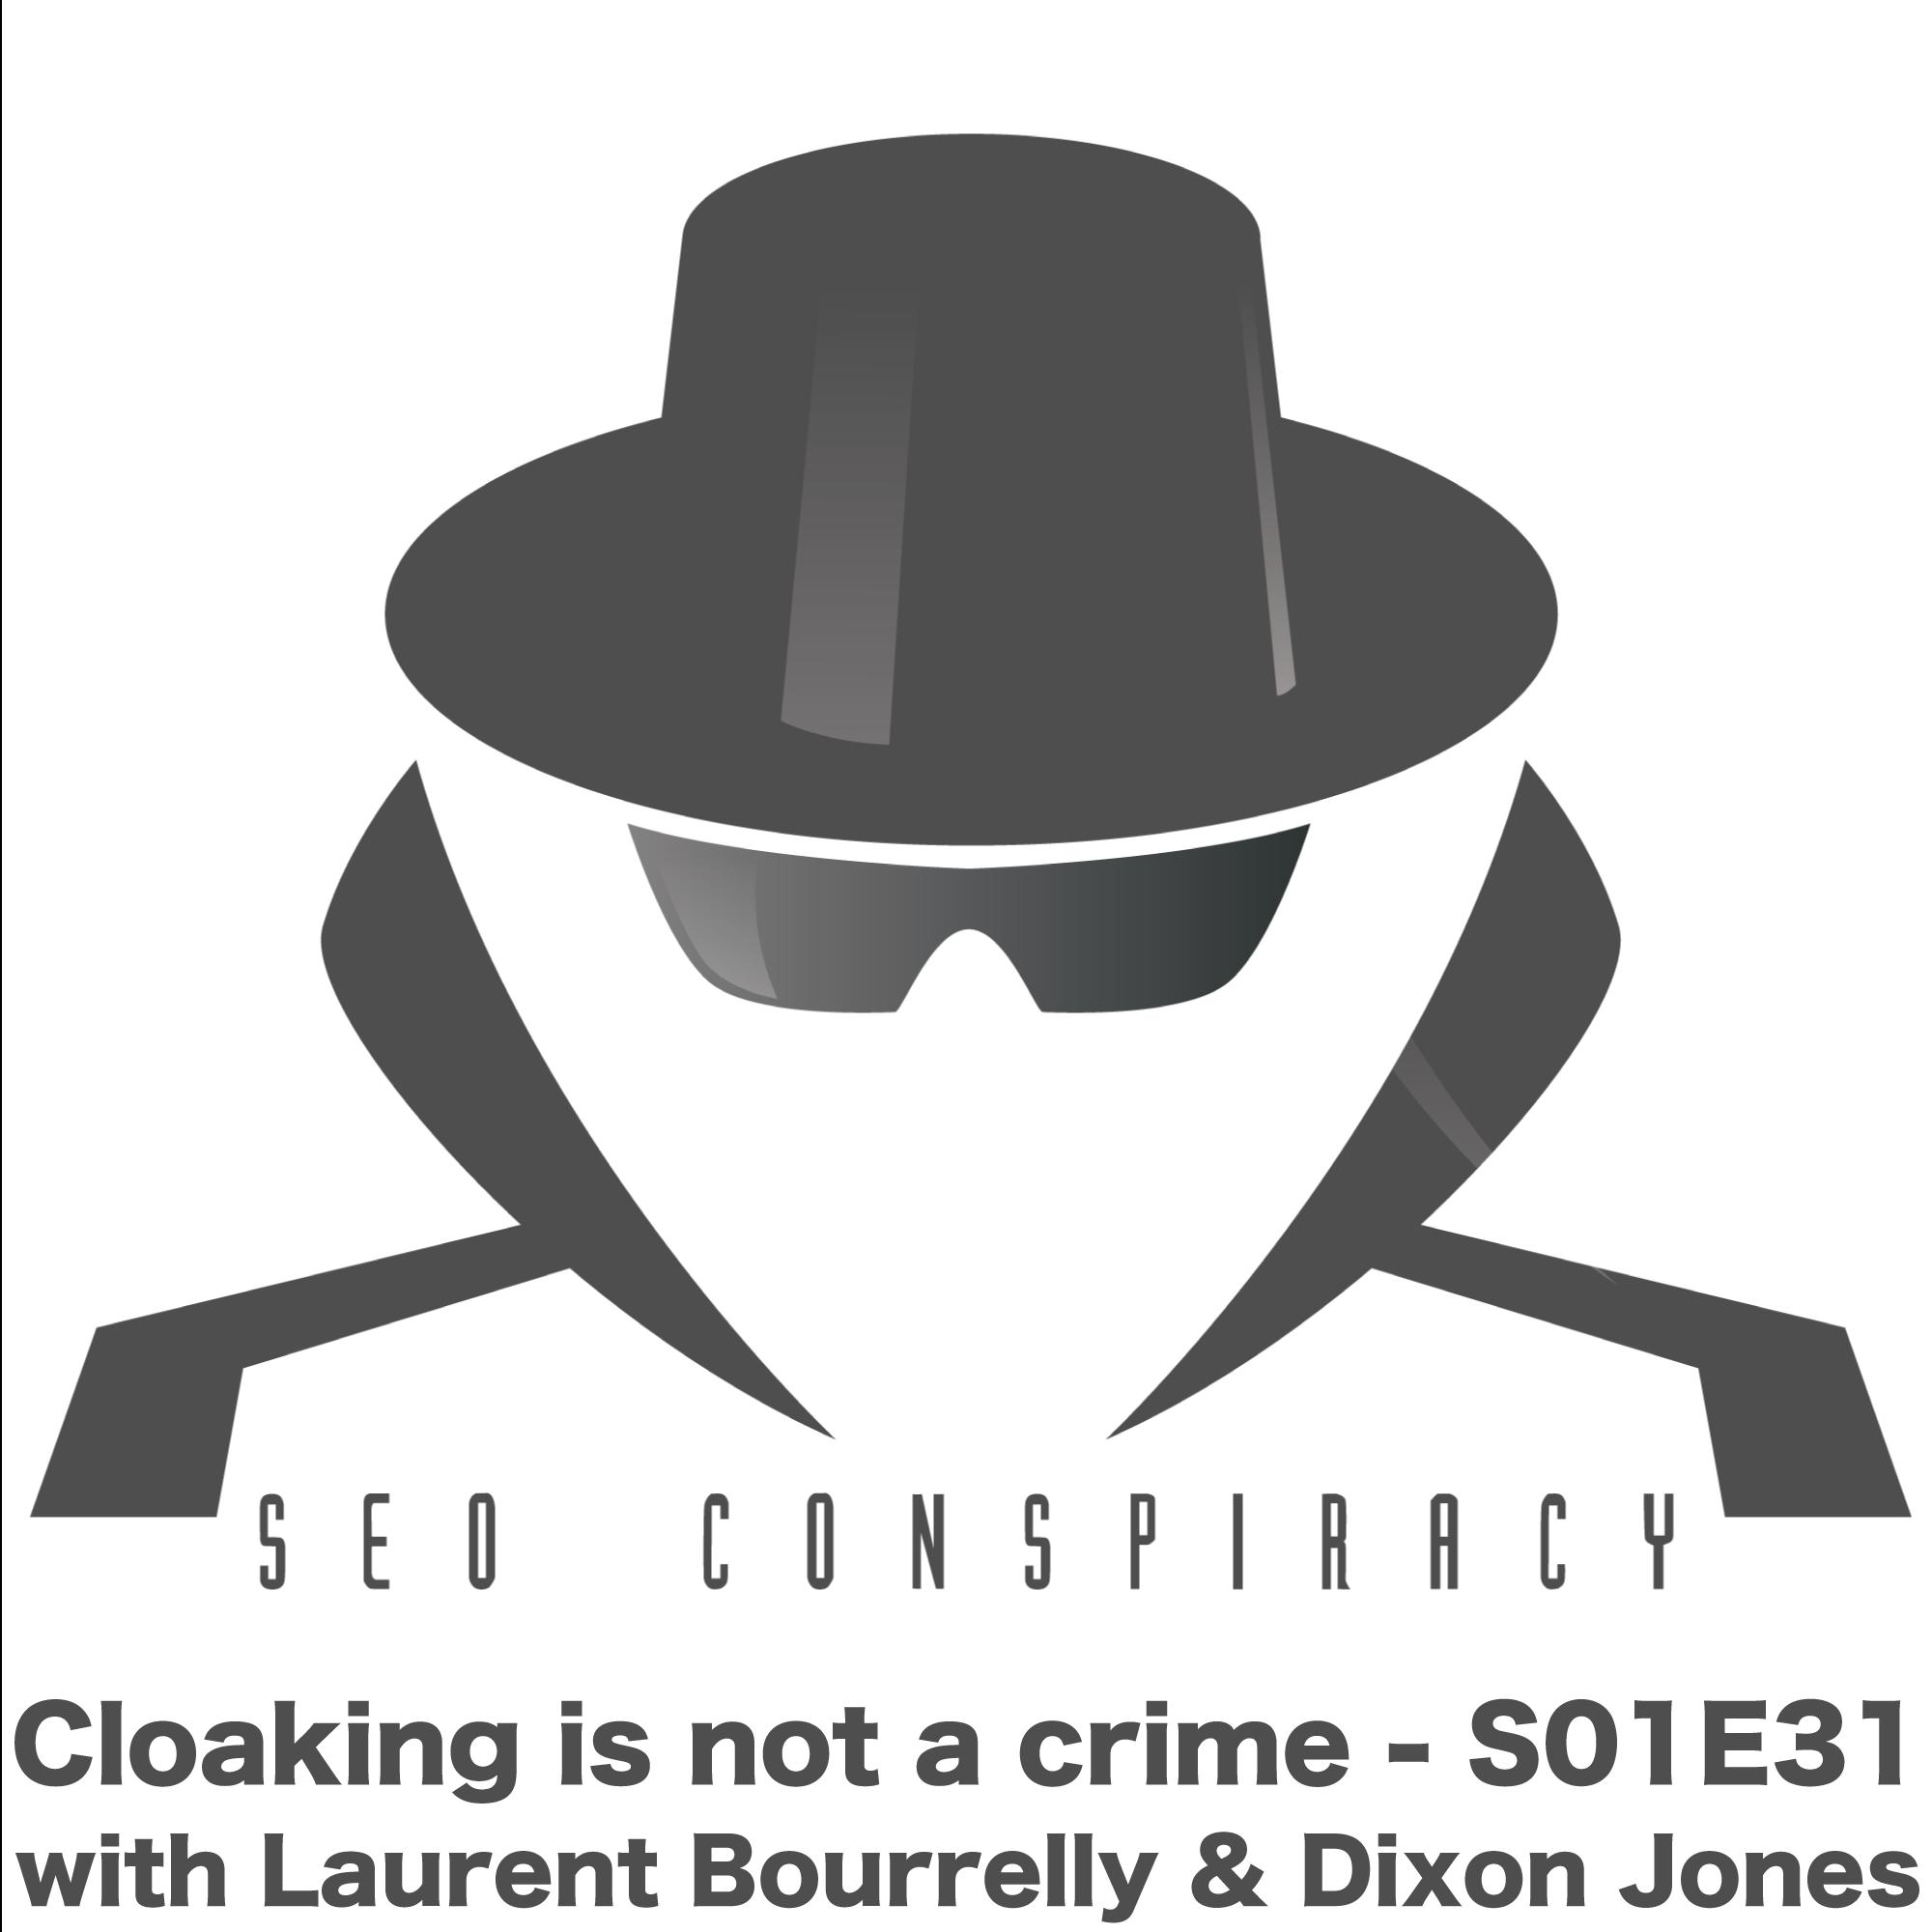 Cloaking is Not a Crime - SEO Conspiracy S01E31